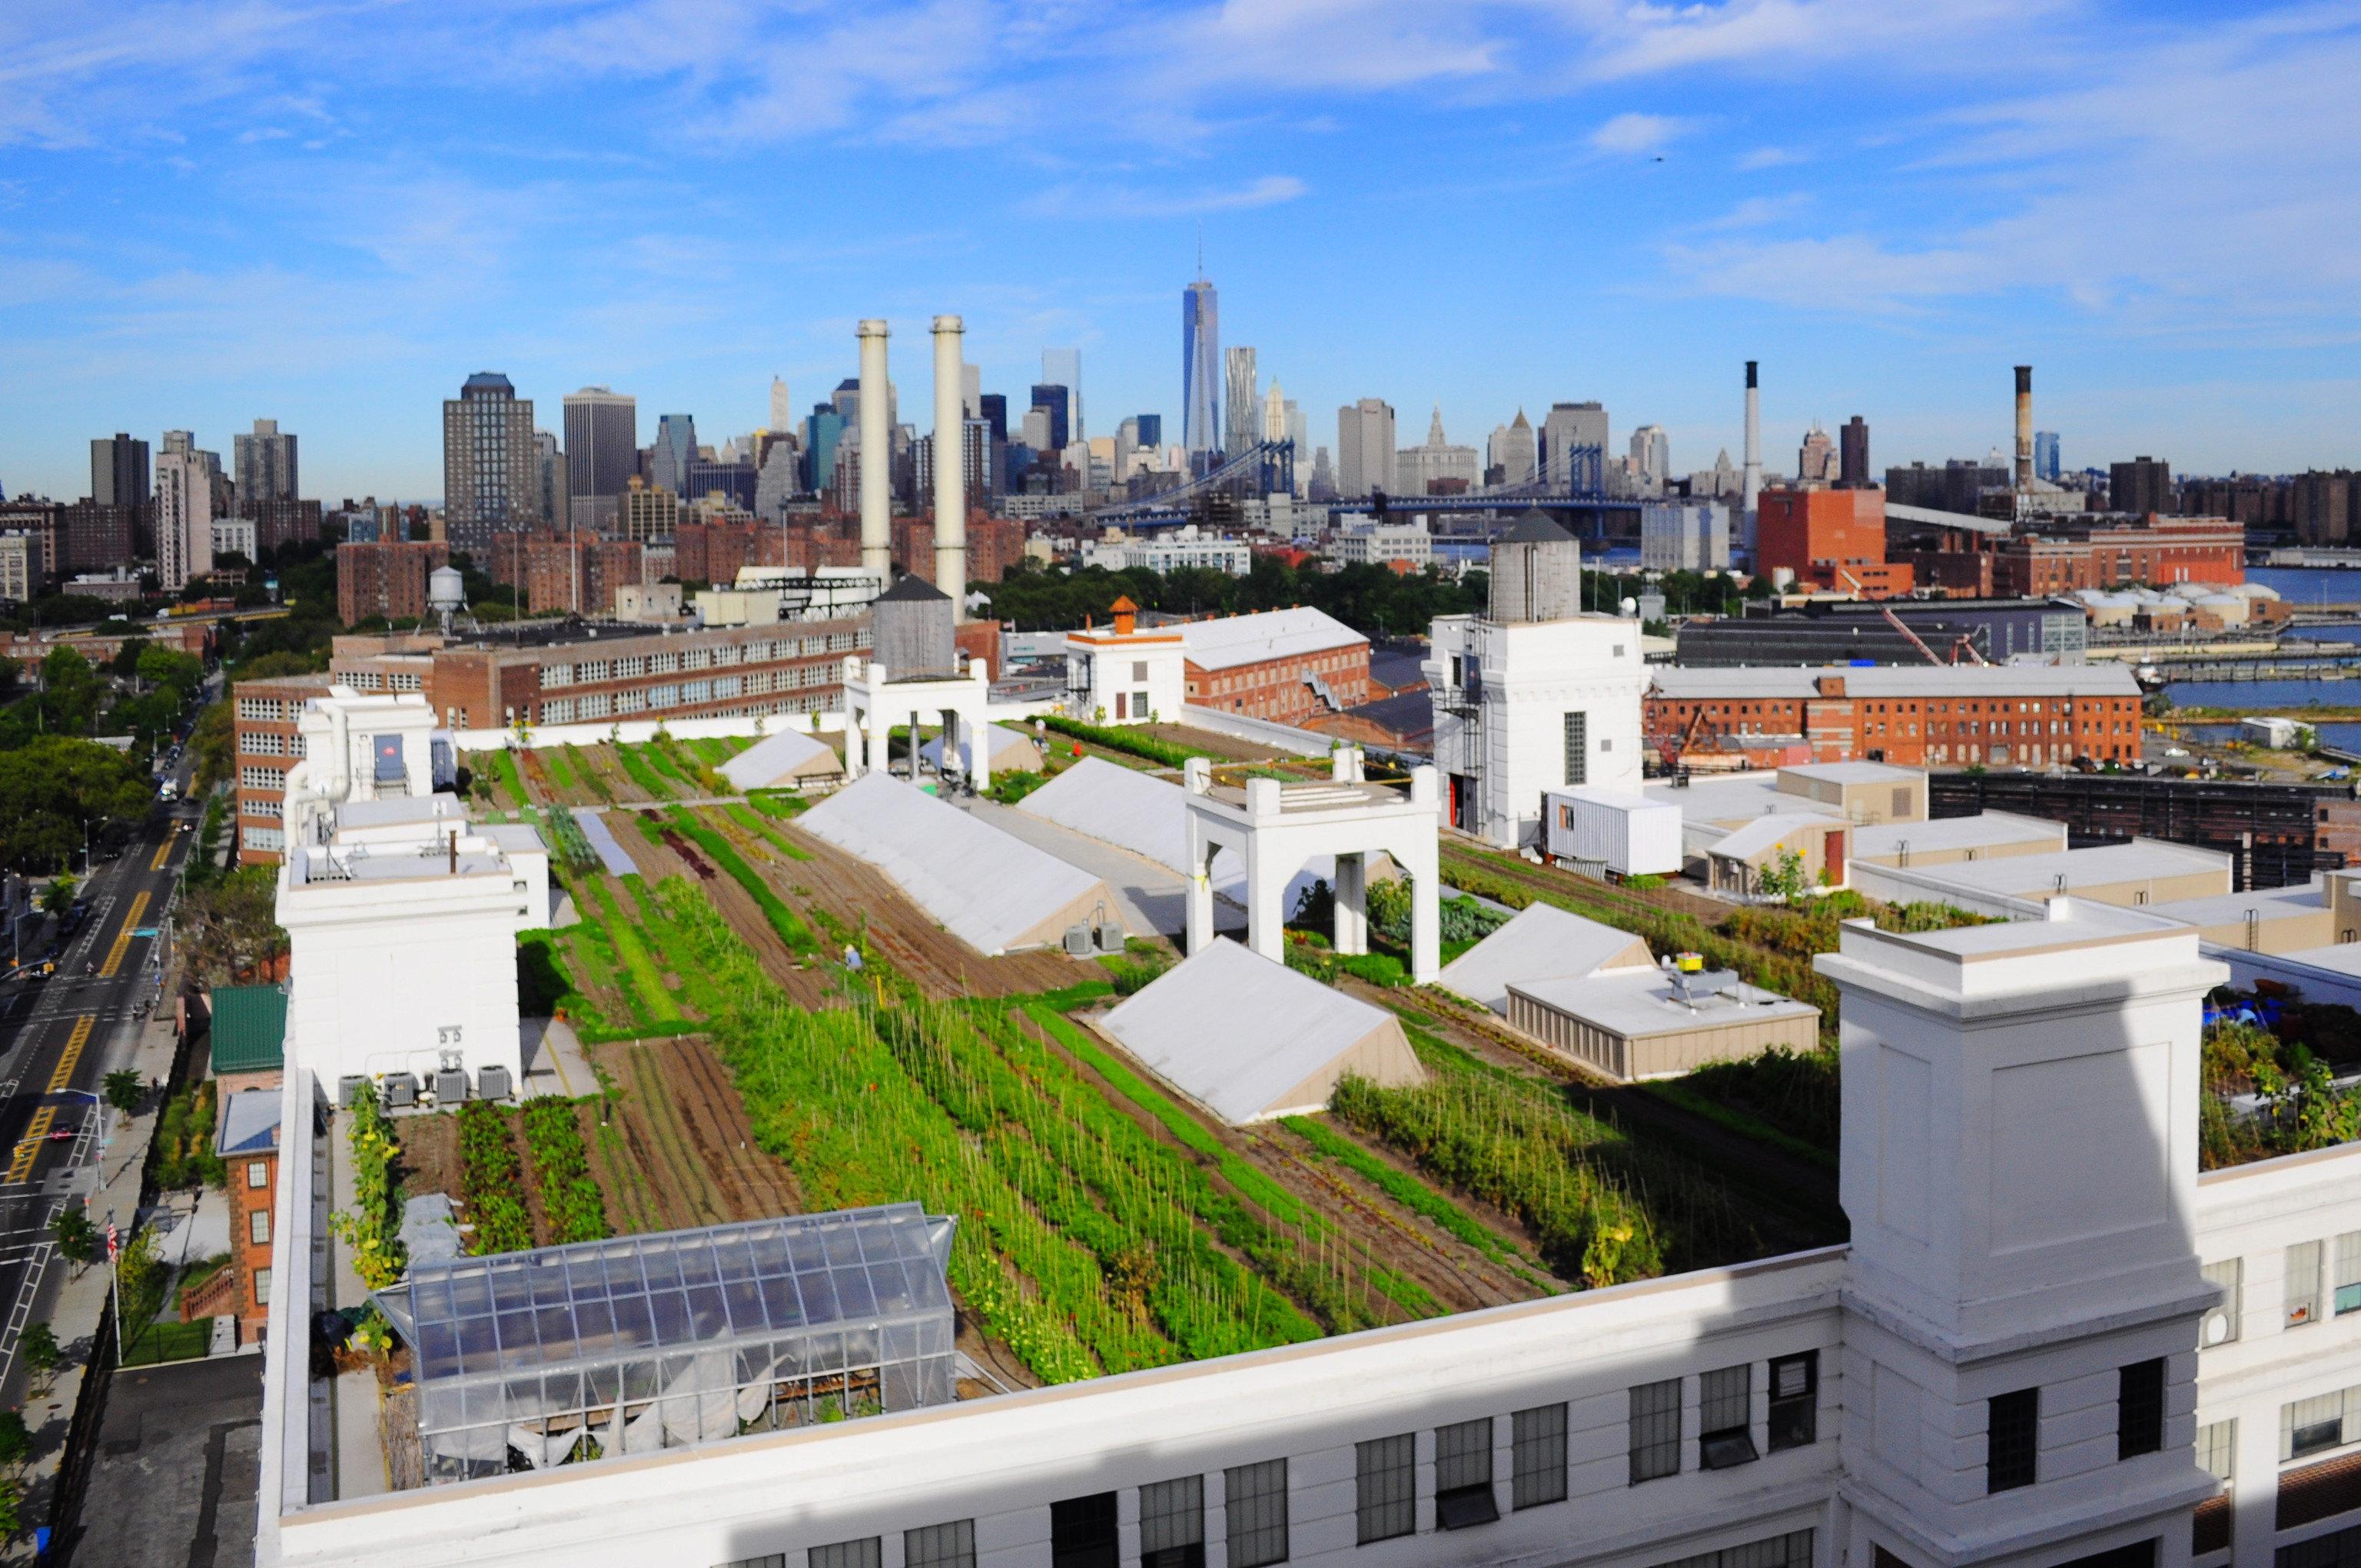 Brooklyn Grange Produce - largest rooftop soil farm